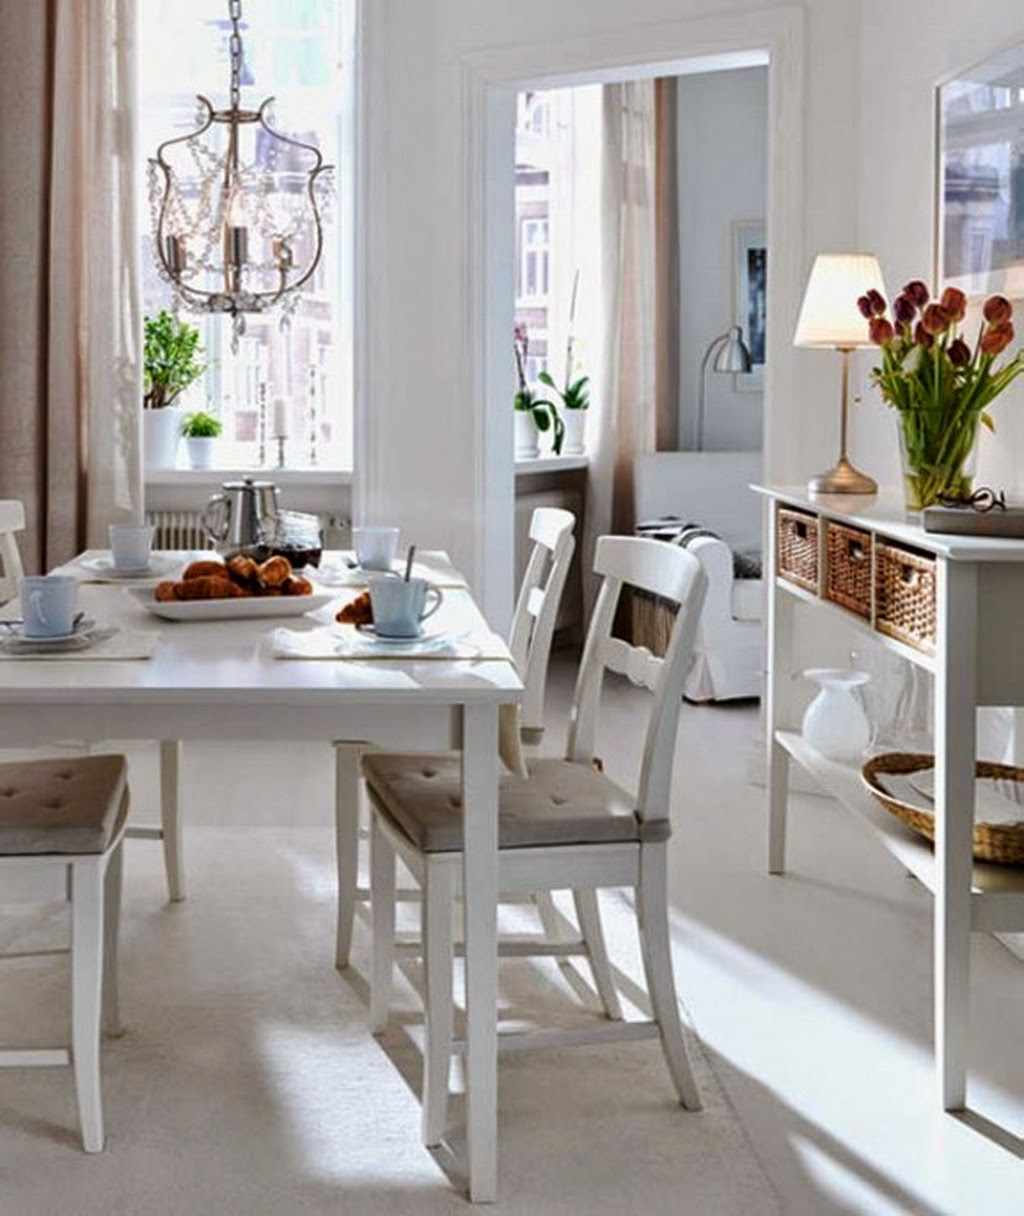 Home Decorating Jobs: Inspiring Interior Design Ideas With IKEA Furniture